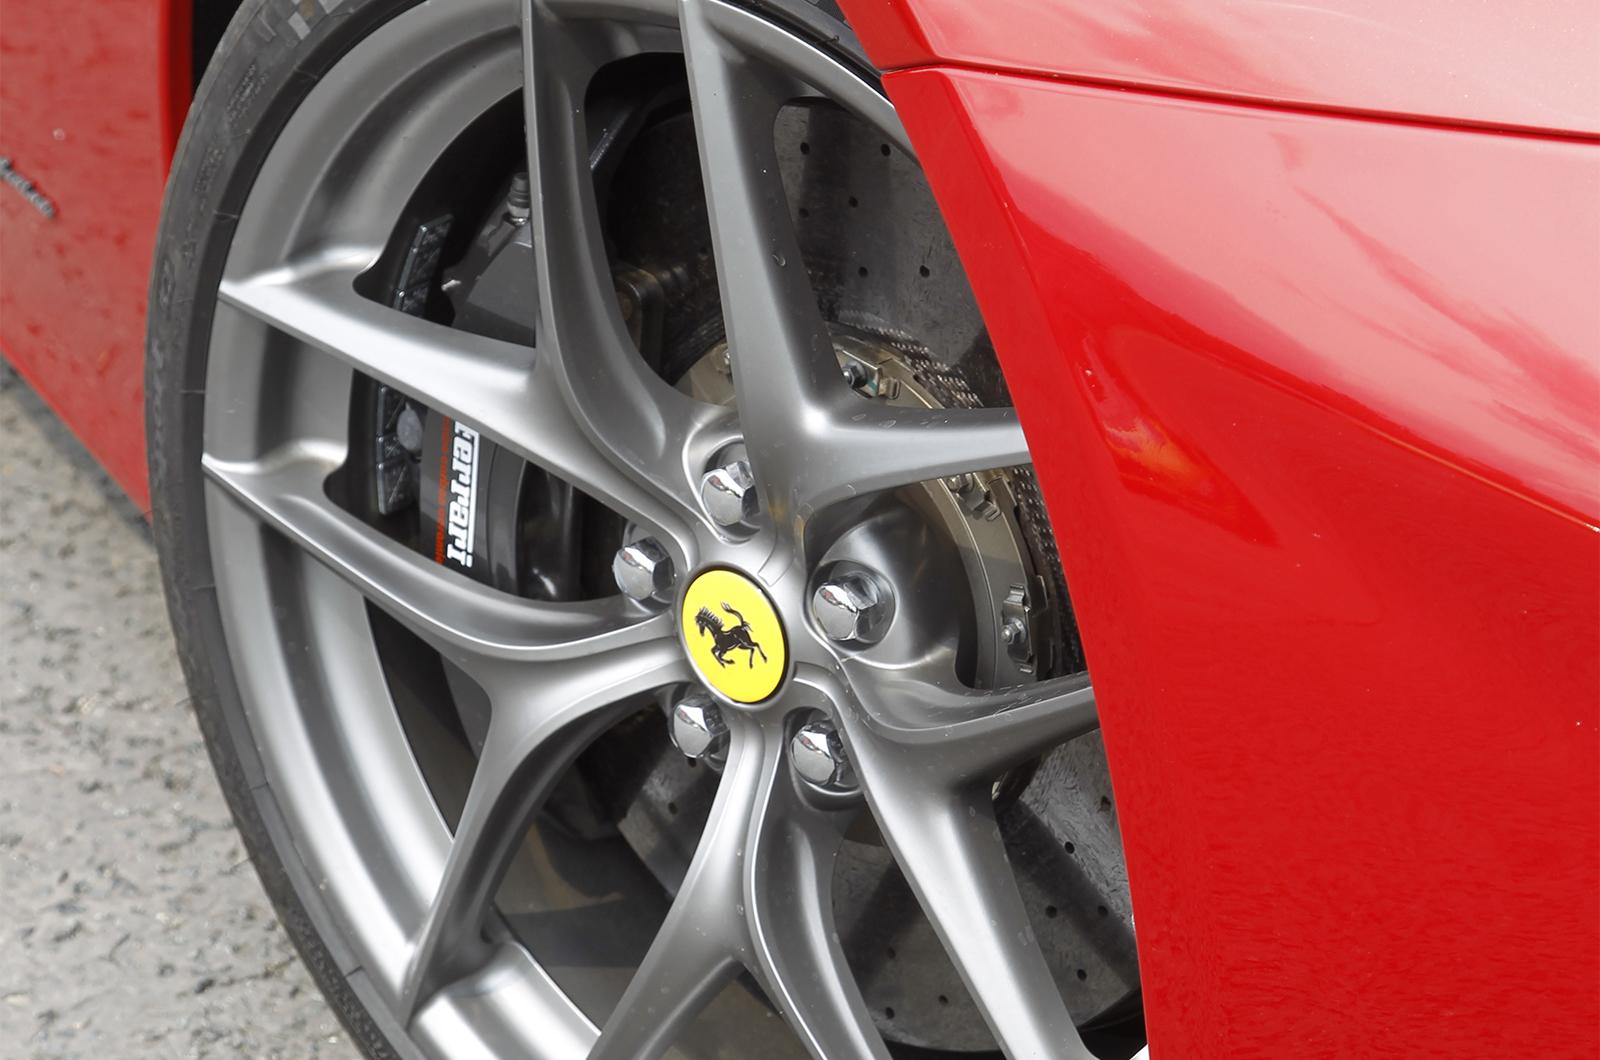 Ferrari F12 Berlinetta 2012 2017 Review 2021 Autocar